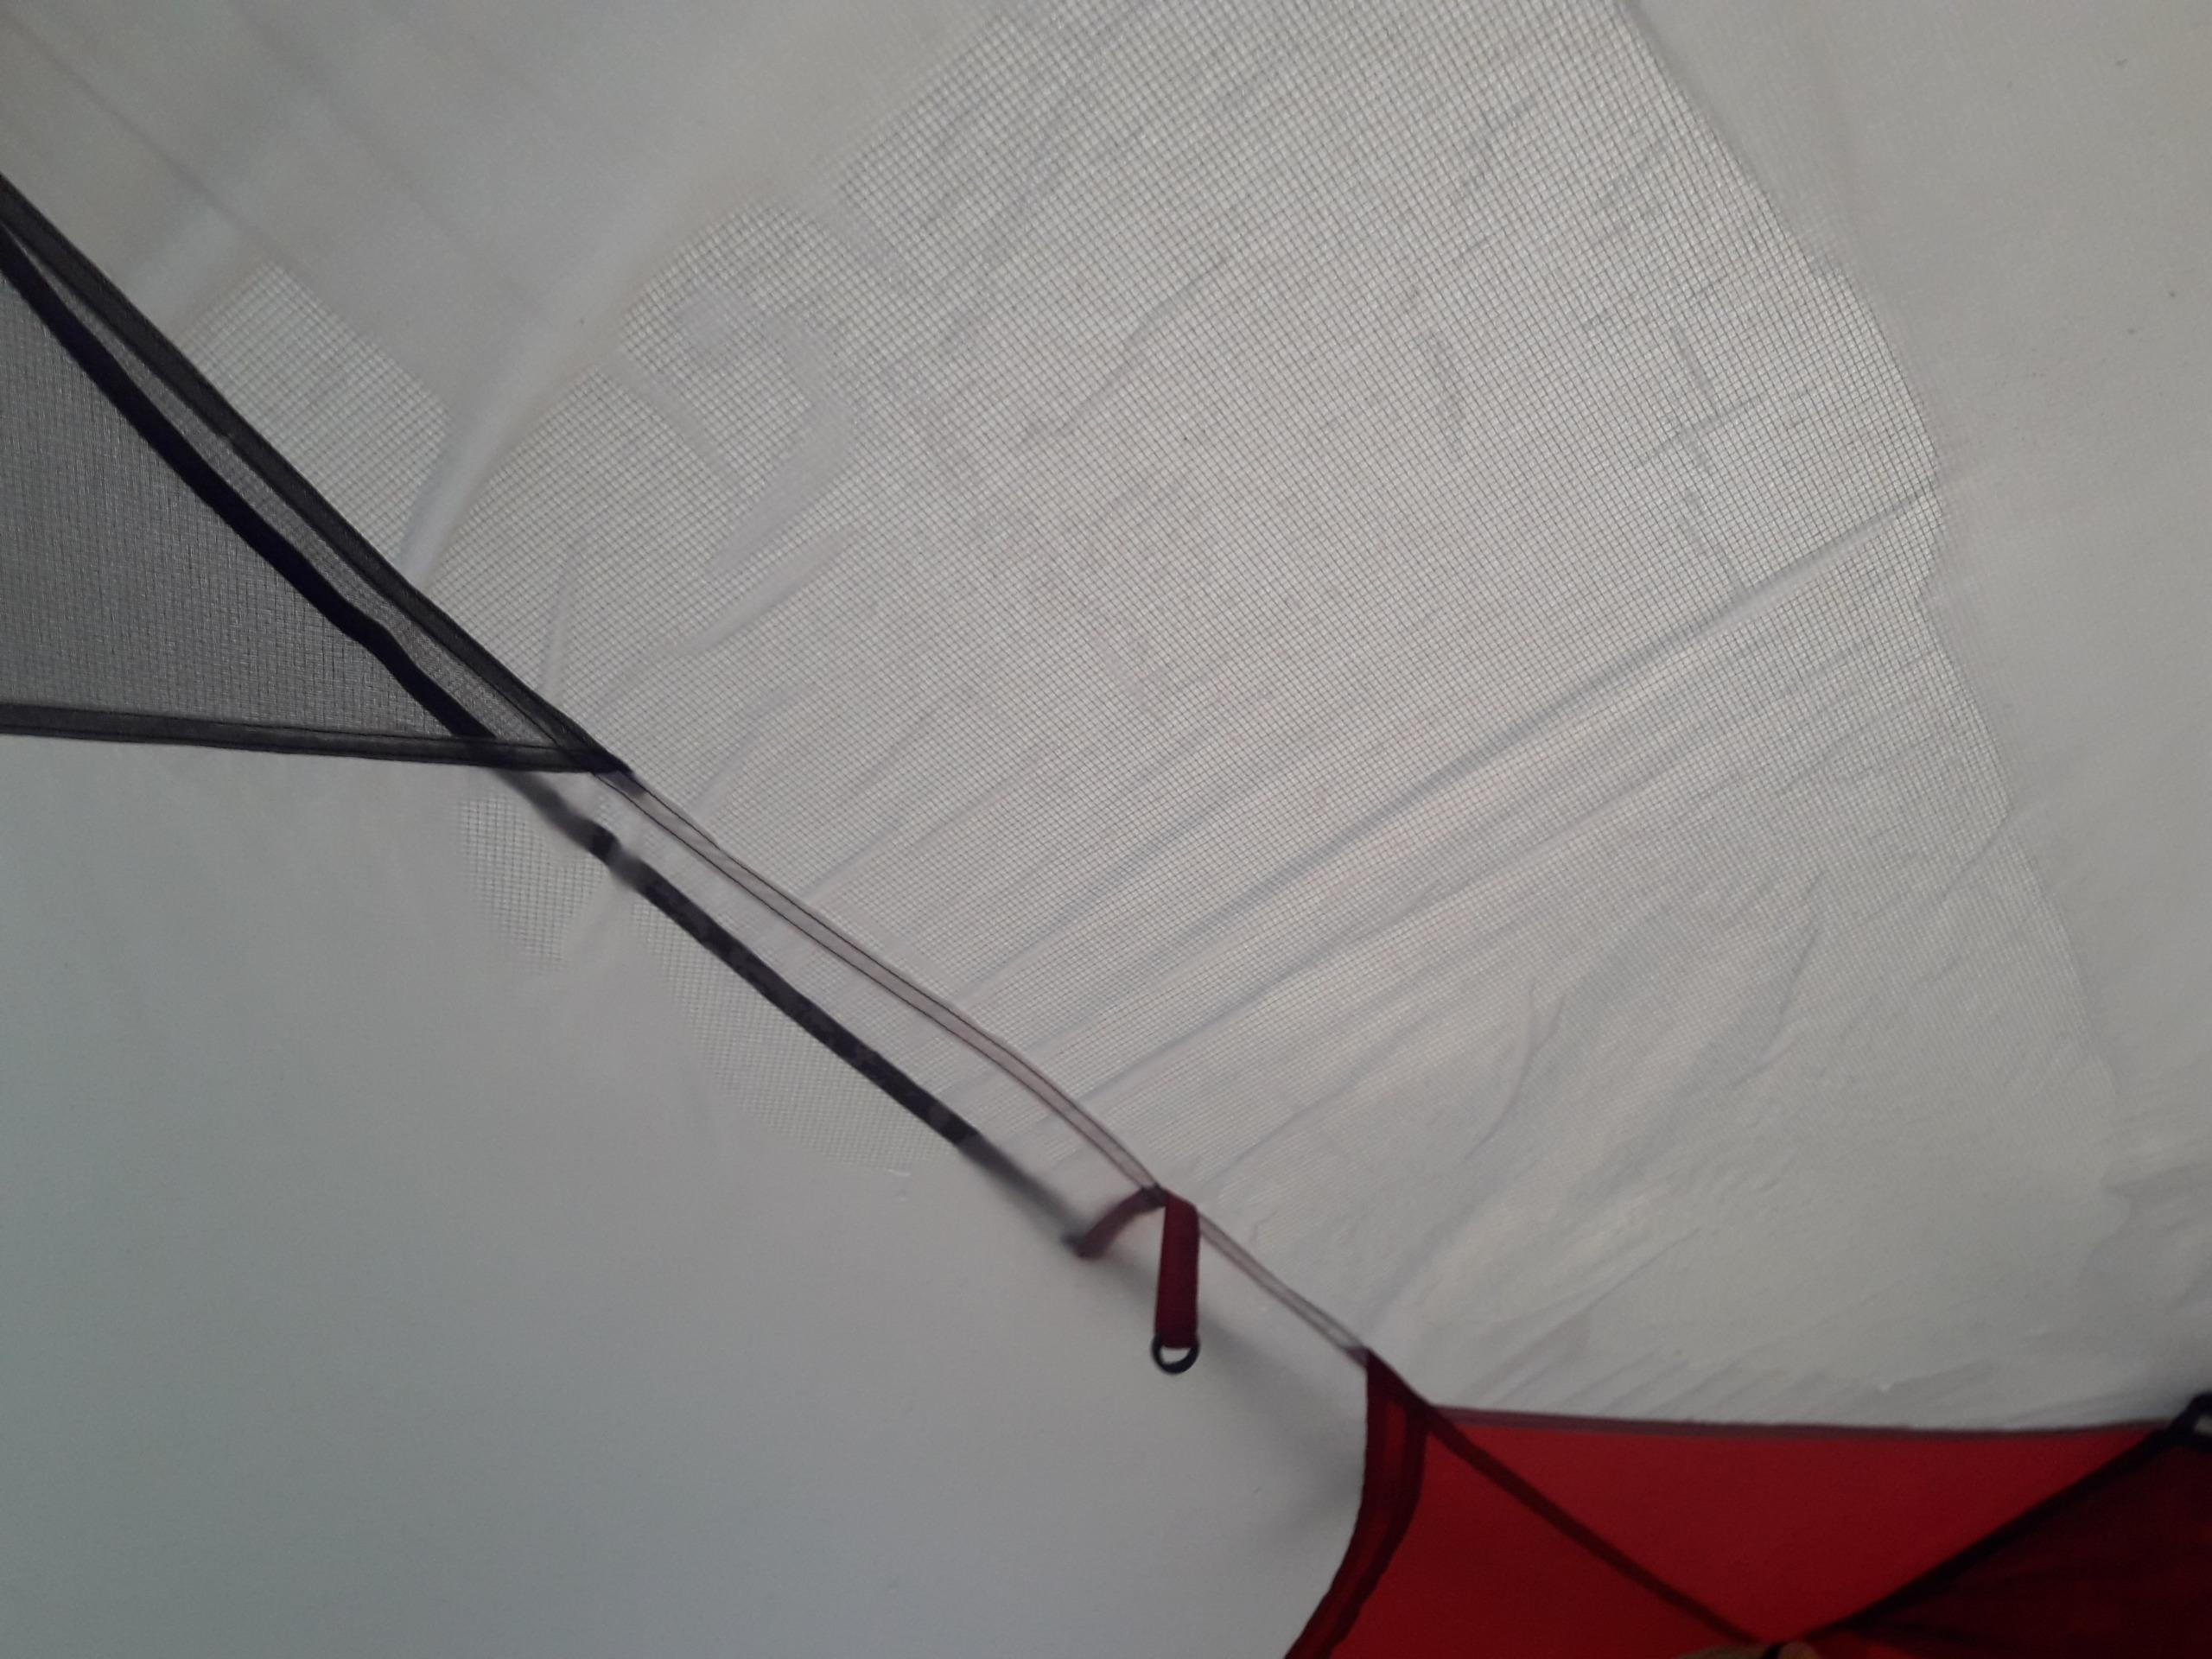 Inside a tent MSR Hubba Tour 2 Leaks